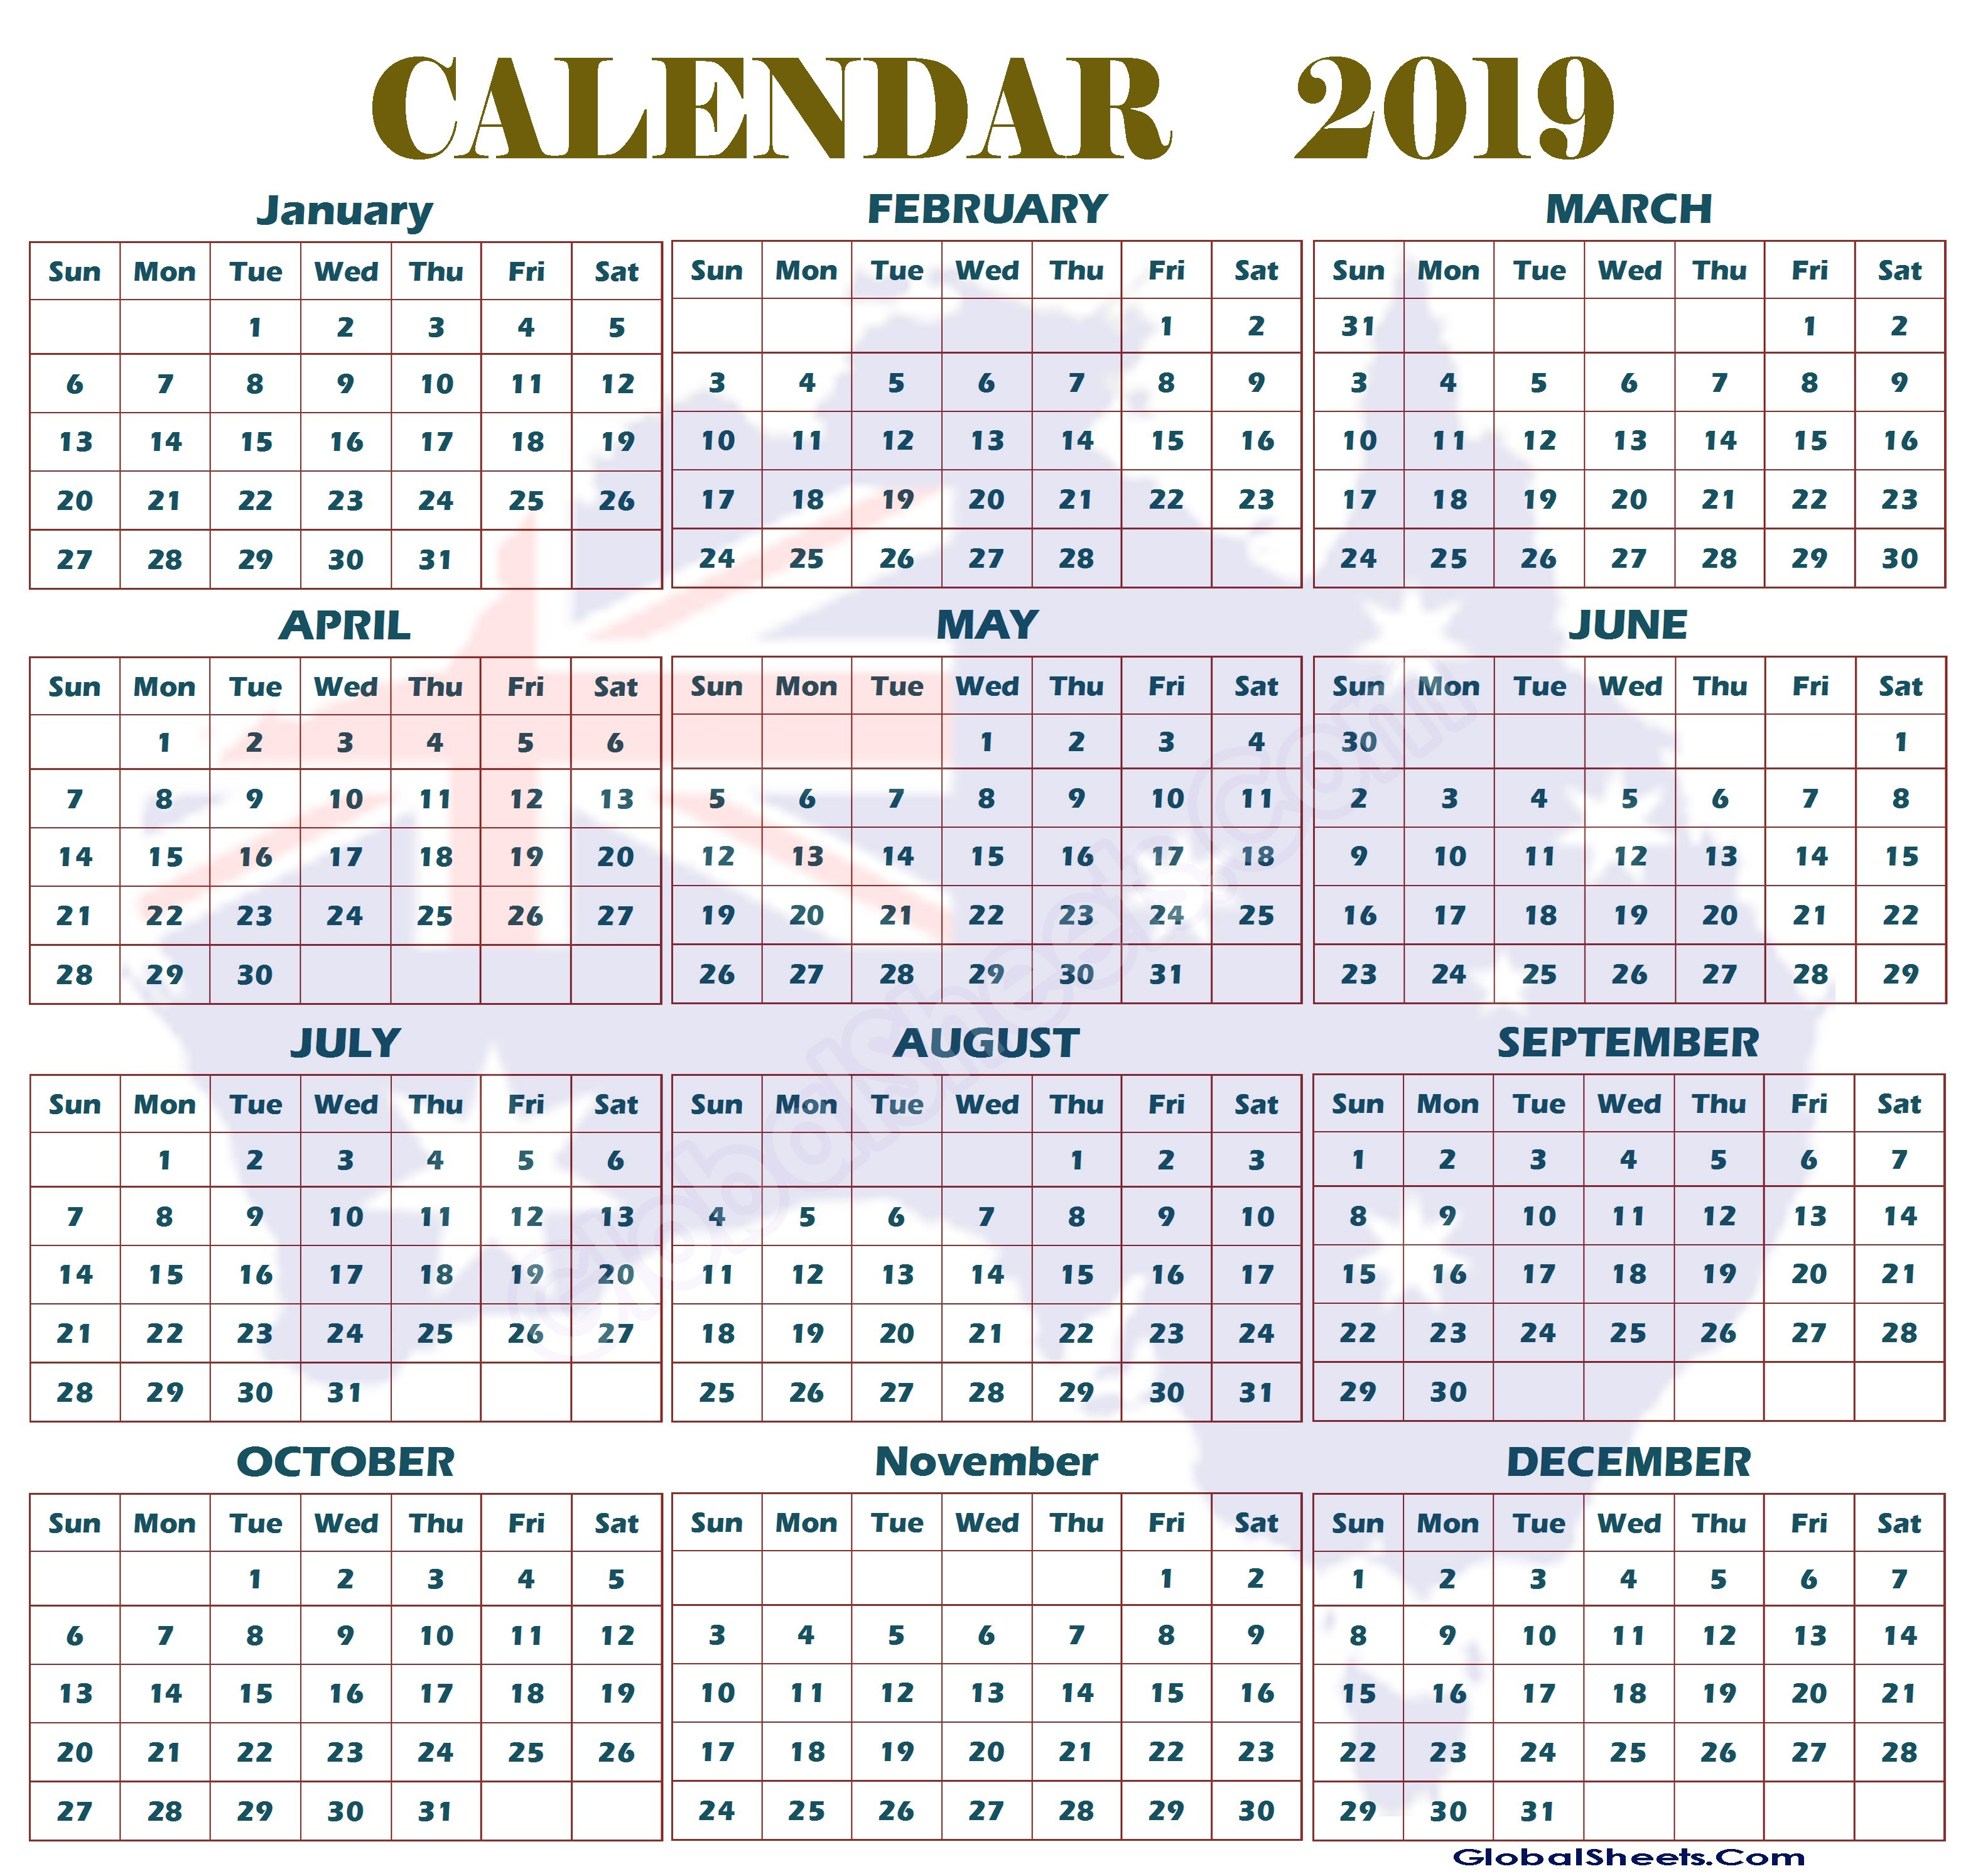 2019 Australian Calendar Printable Australian Calendar 2019 Printable 2019 Yearly Calendar